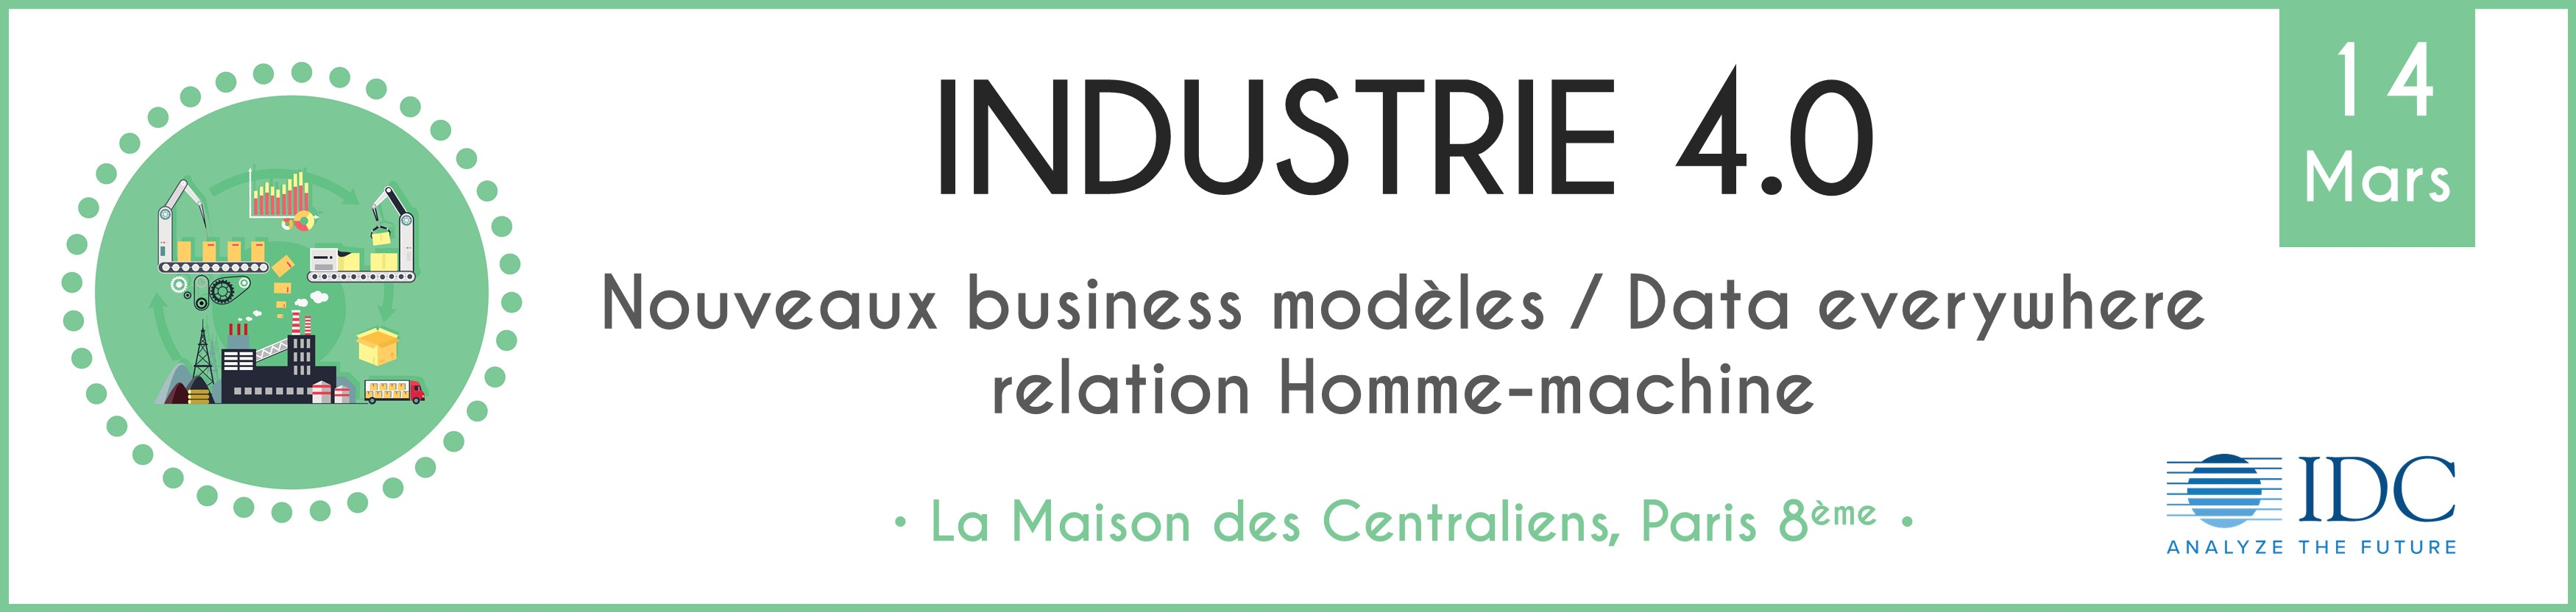 Conférence IDC - Industrie 4.0 - 14 mars 2019